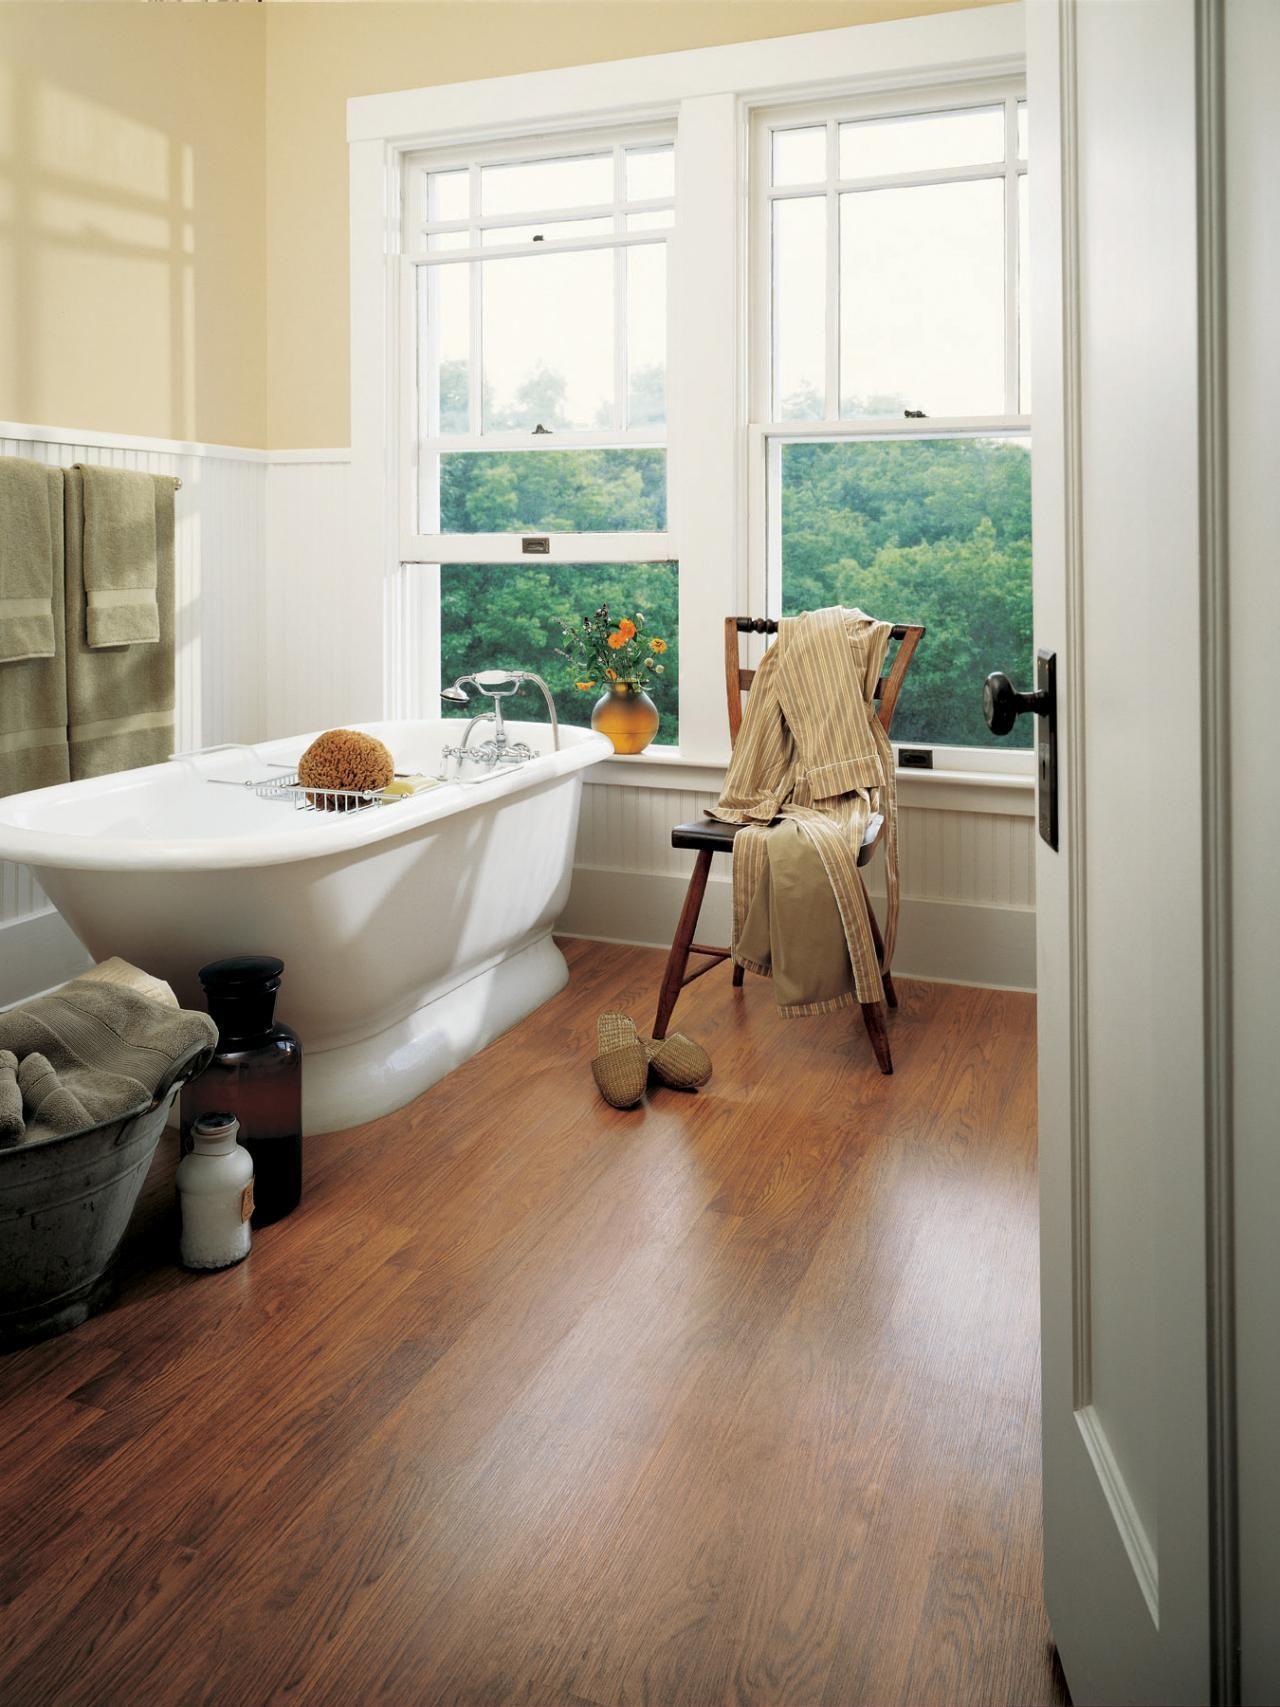 Bathroom Floor Buying Guide, #Bathroom #blackMarbleBathroom #Buying #Floor #Guide #MarbleBathroomaccessories #MarbleBathroomcountertop #MarbleBathroomdecor #MarbleBathroomfloor #MarbleBathroomideas #MarbleBathroommodern #MarbleBathroomtile #smallMarbleBathroom #whiteMarbleBathroom